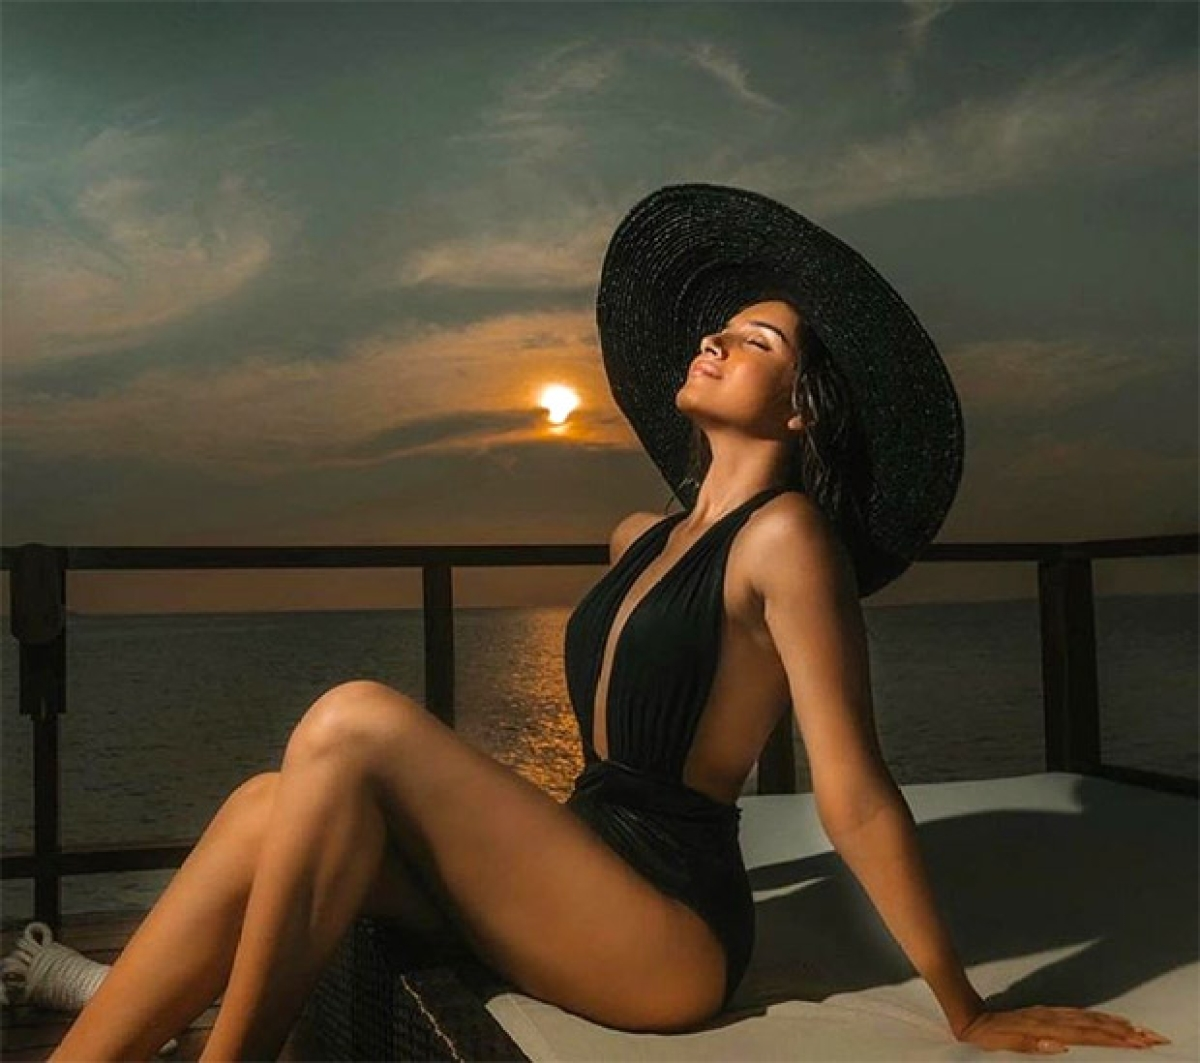 Tara Sutaria Images, HD Photos, Wallpapers, Latest Photoshoot...FabbyNews.com